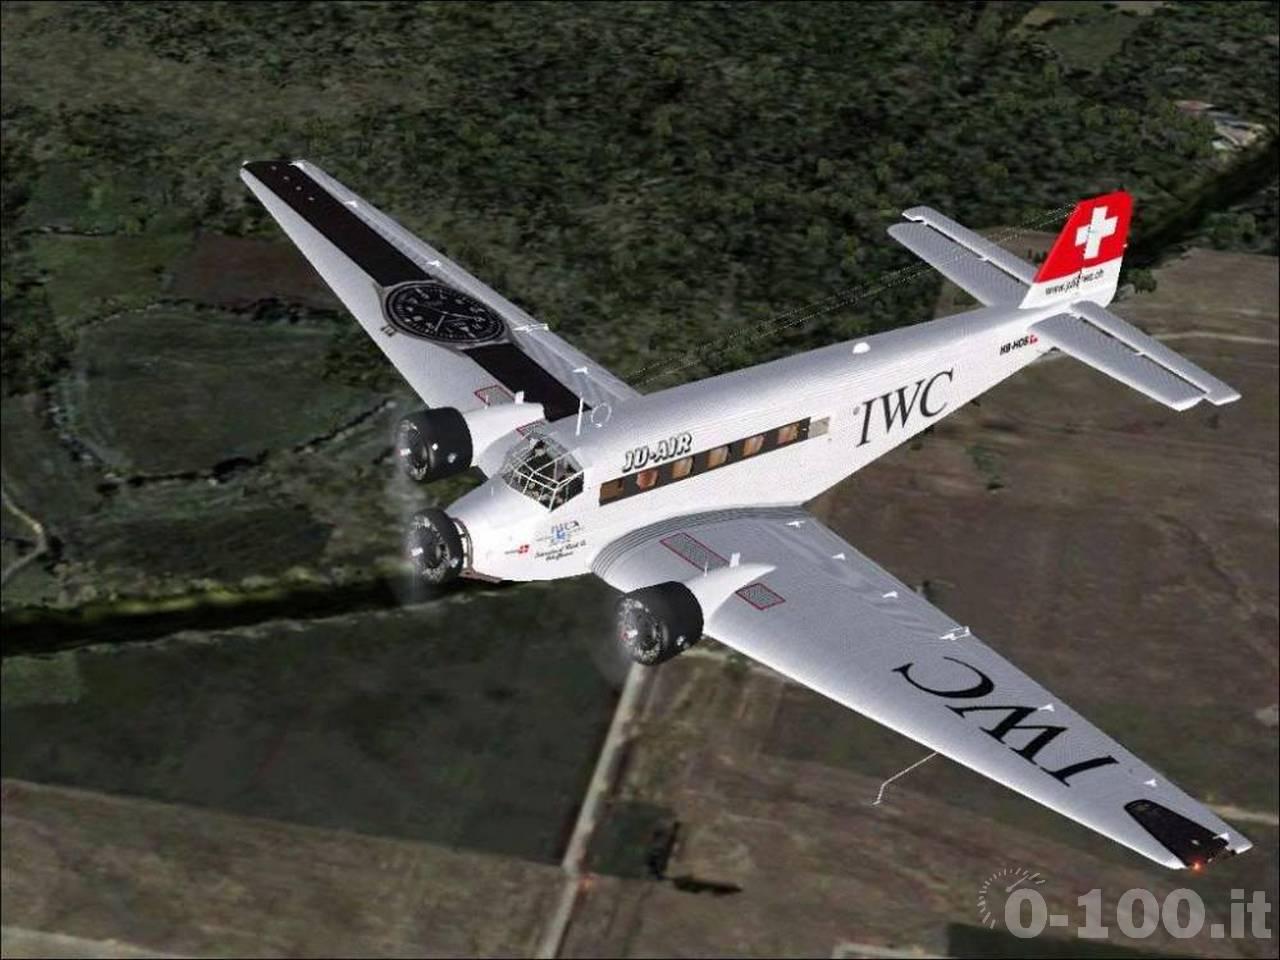 iwc-pilot-watch-chronograph-edition-ju-air-ref-iw387809